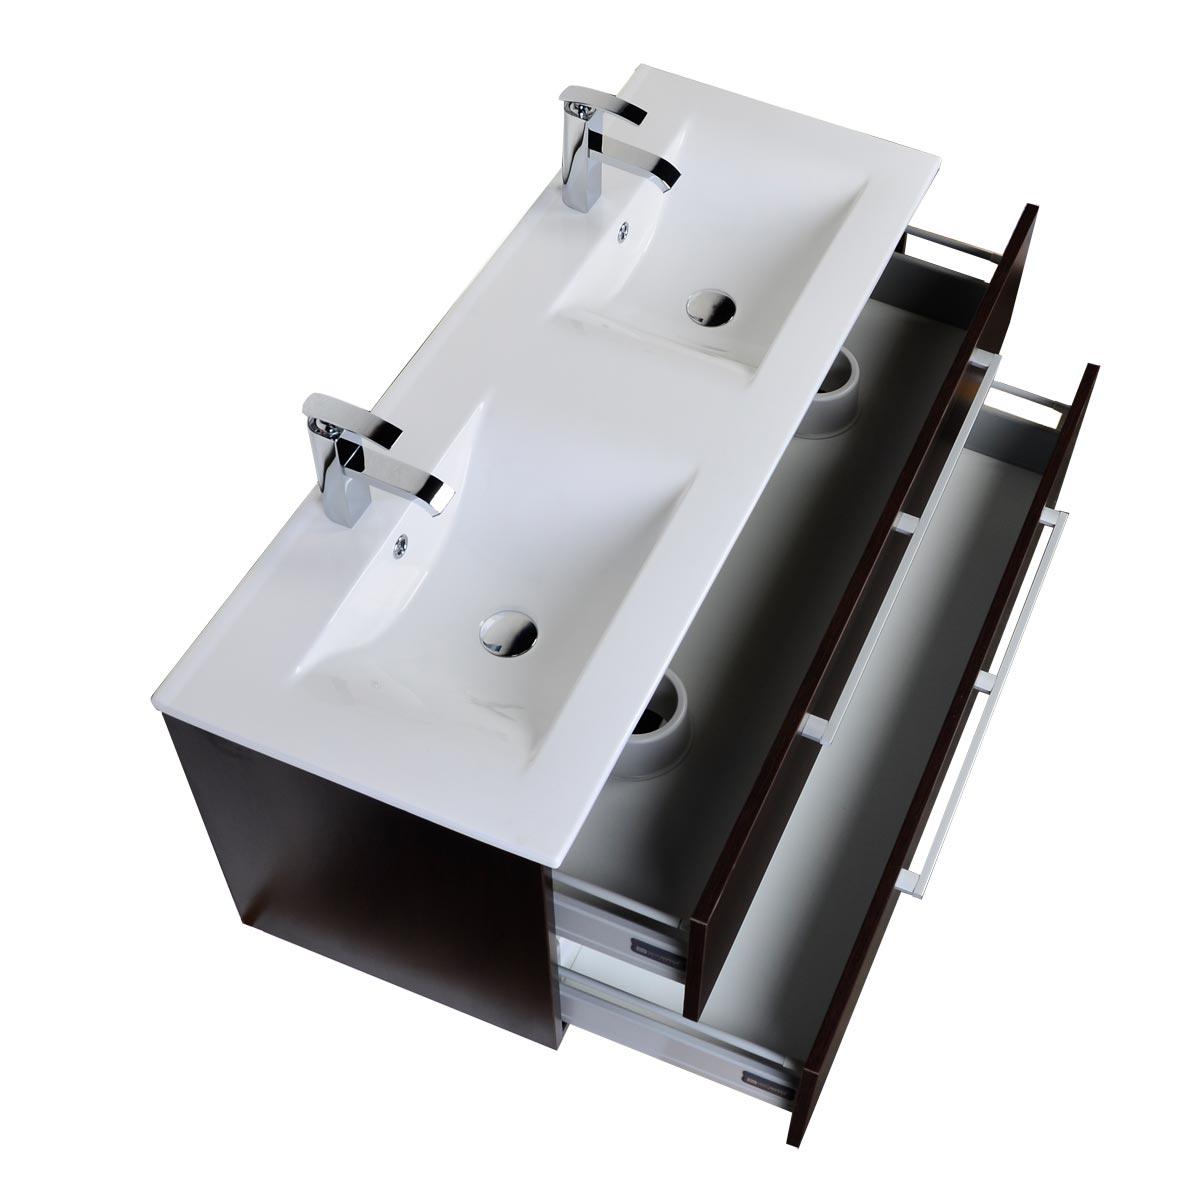 Buy caen 48 inch wall mount double bathroom vanity set - Wall mount bathroom vanity cabinets ...